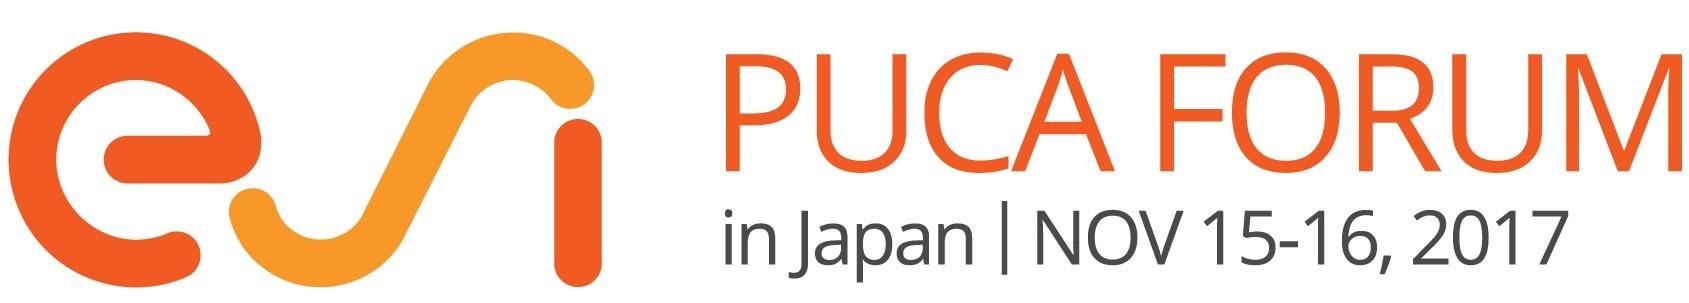 puca_forum_logo_rgb_0.jpg